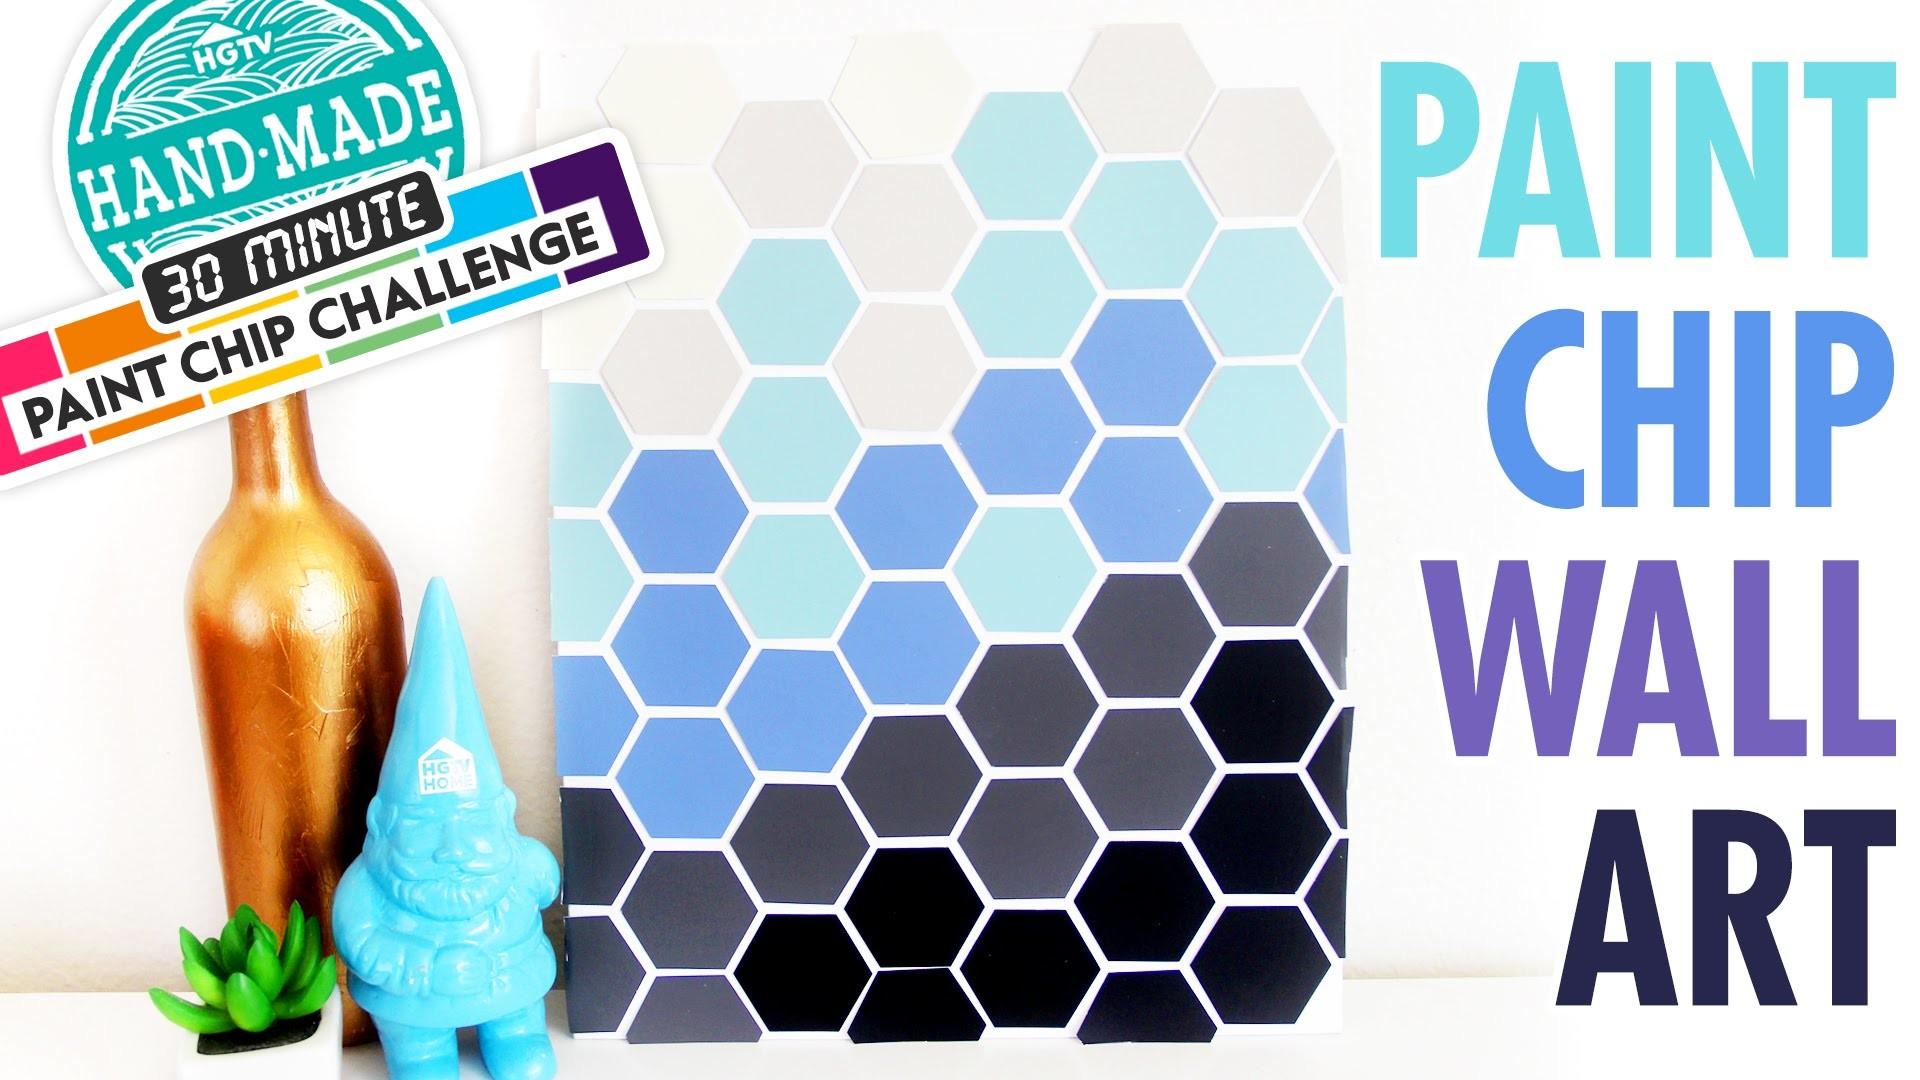 DIY Paint Chip Wall Art - Marianne's 30 Minute Craft Challenge - HGTV Handmade